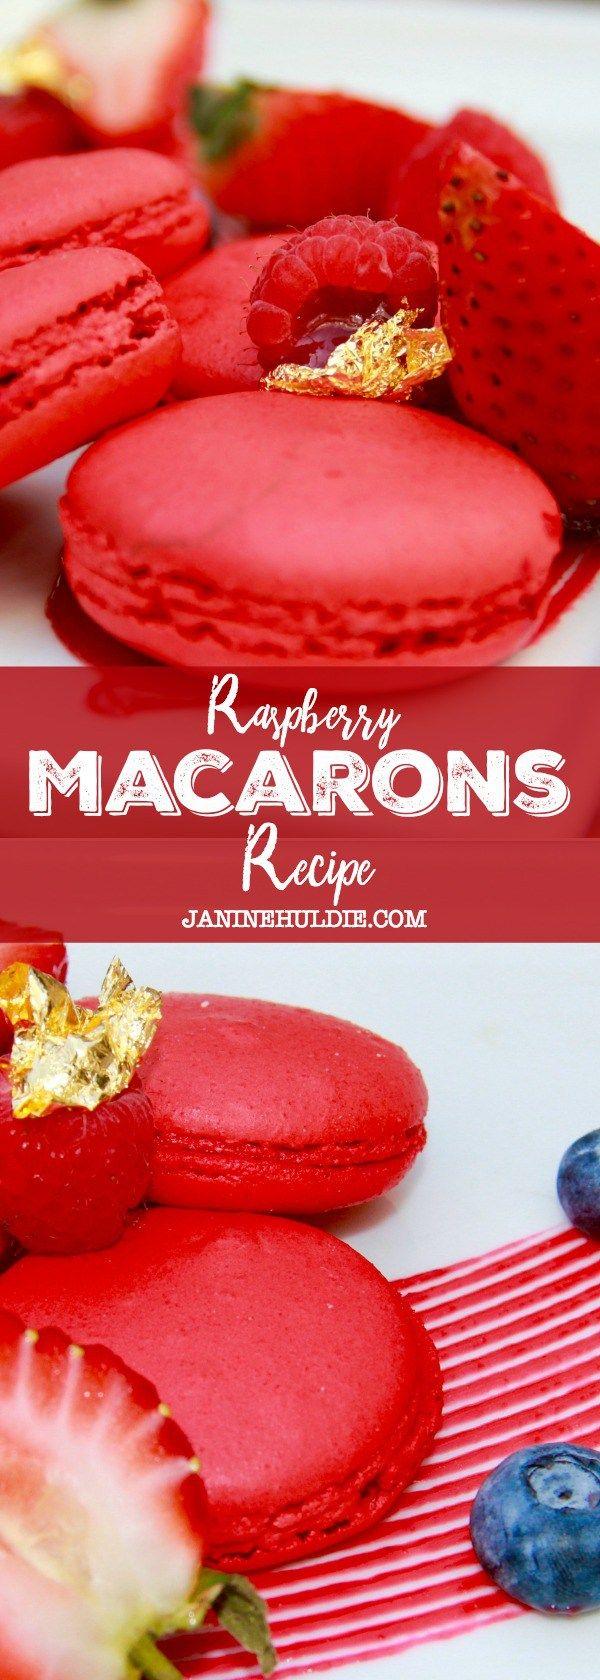 Raspberry Macarons Recipe